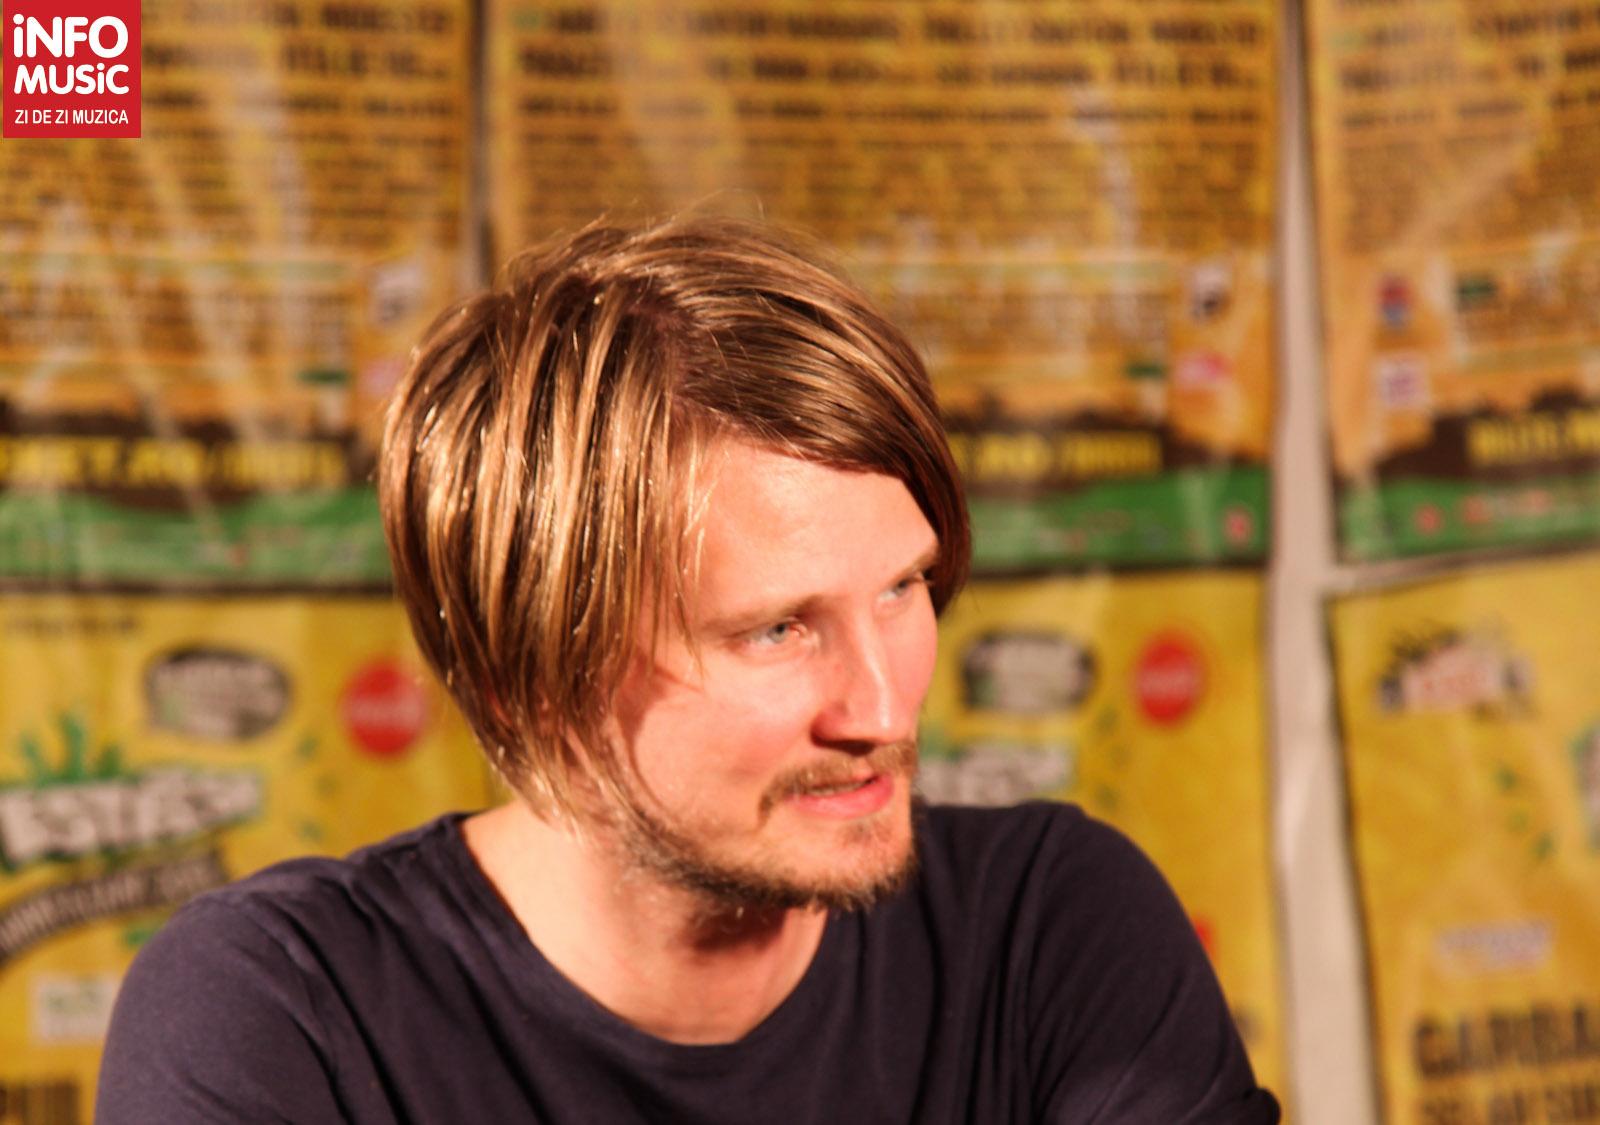 Torbjørn Brundtland (Röyksopp)